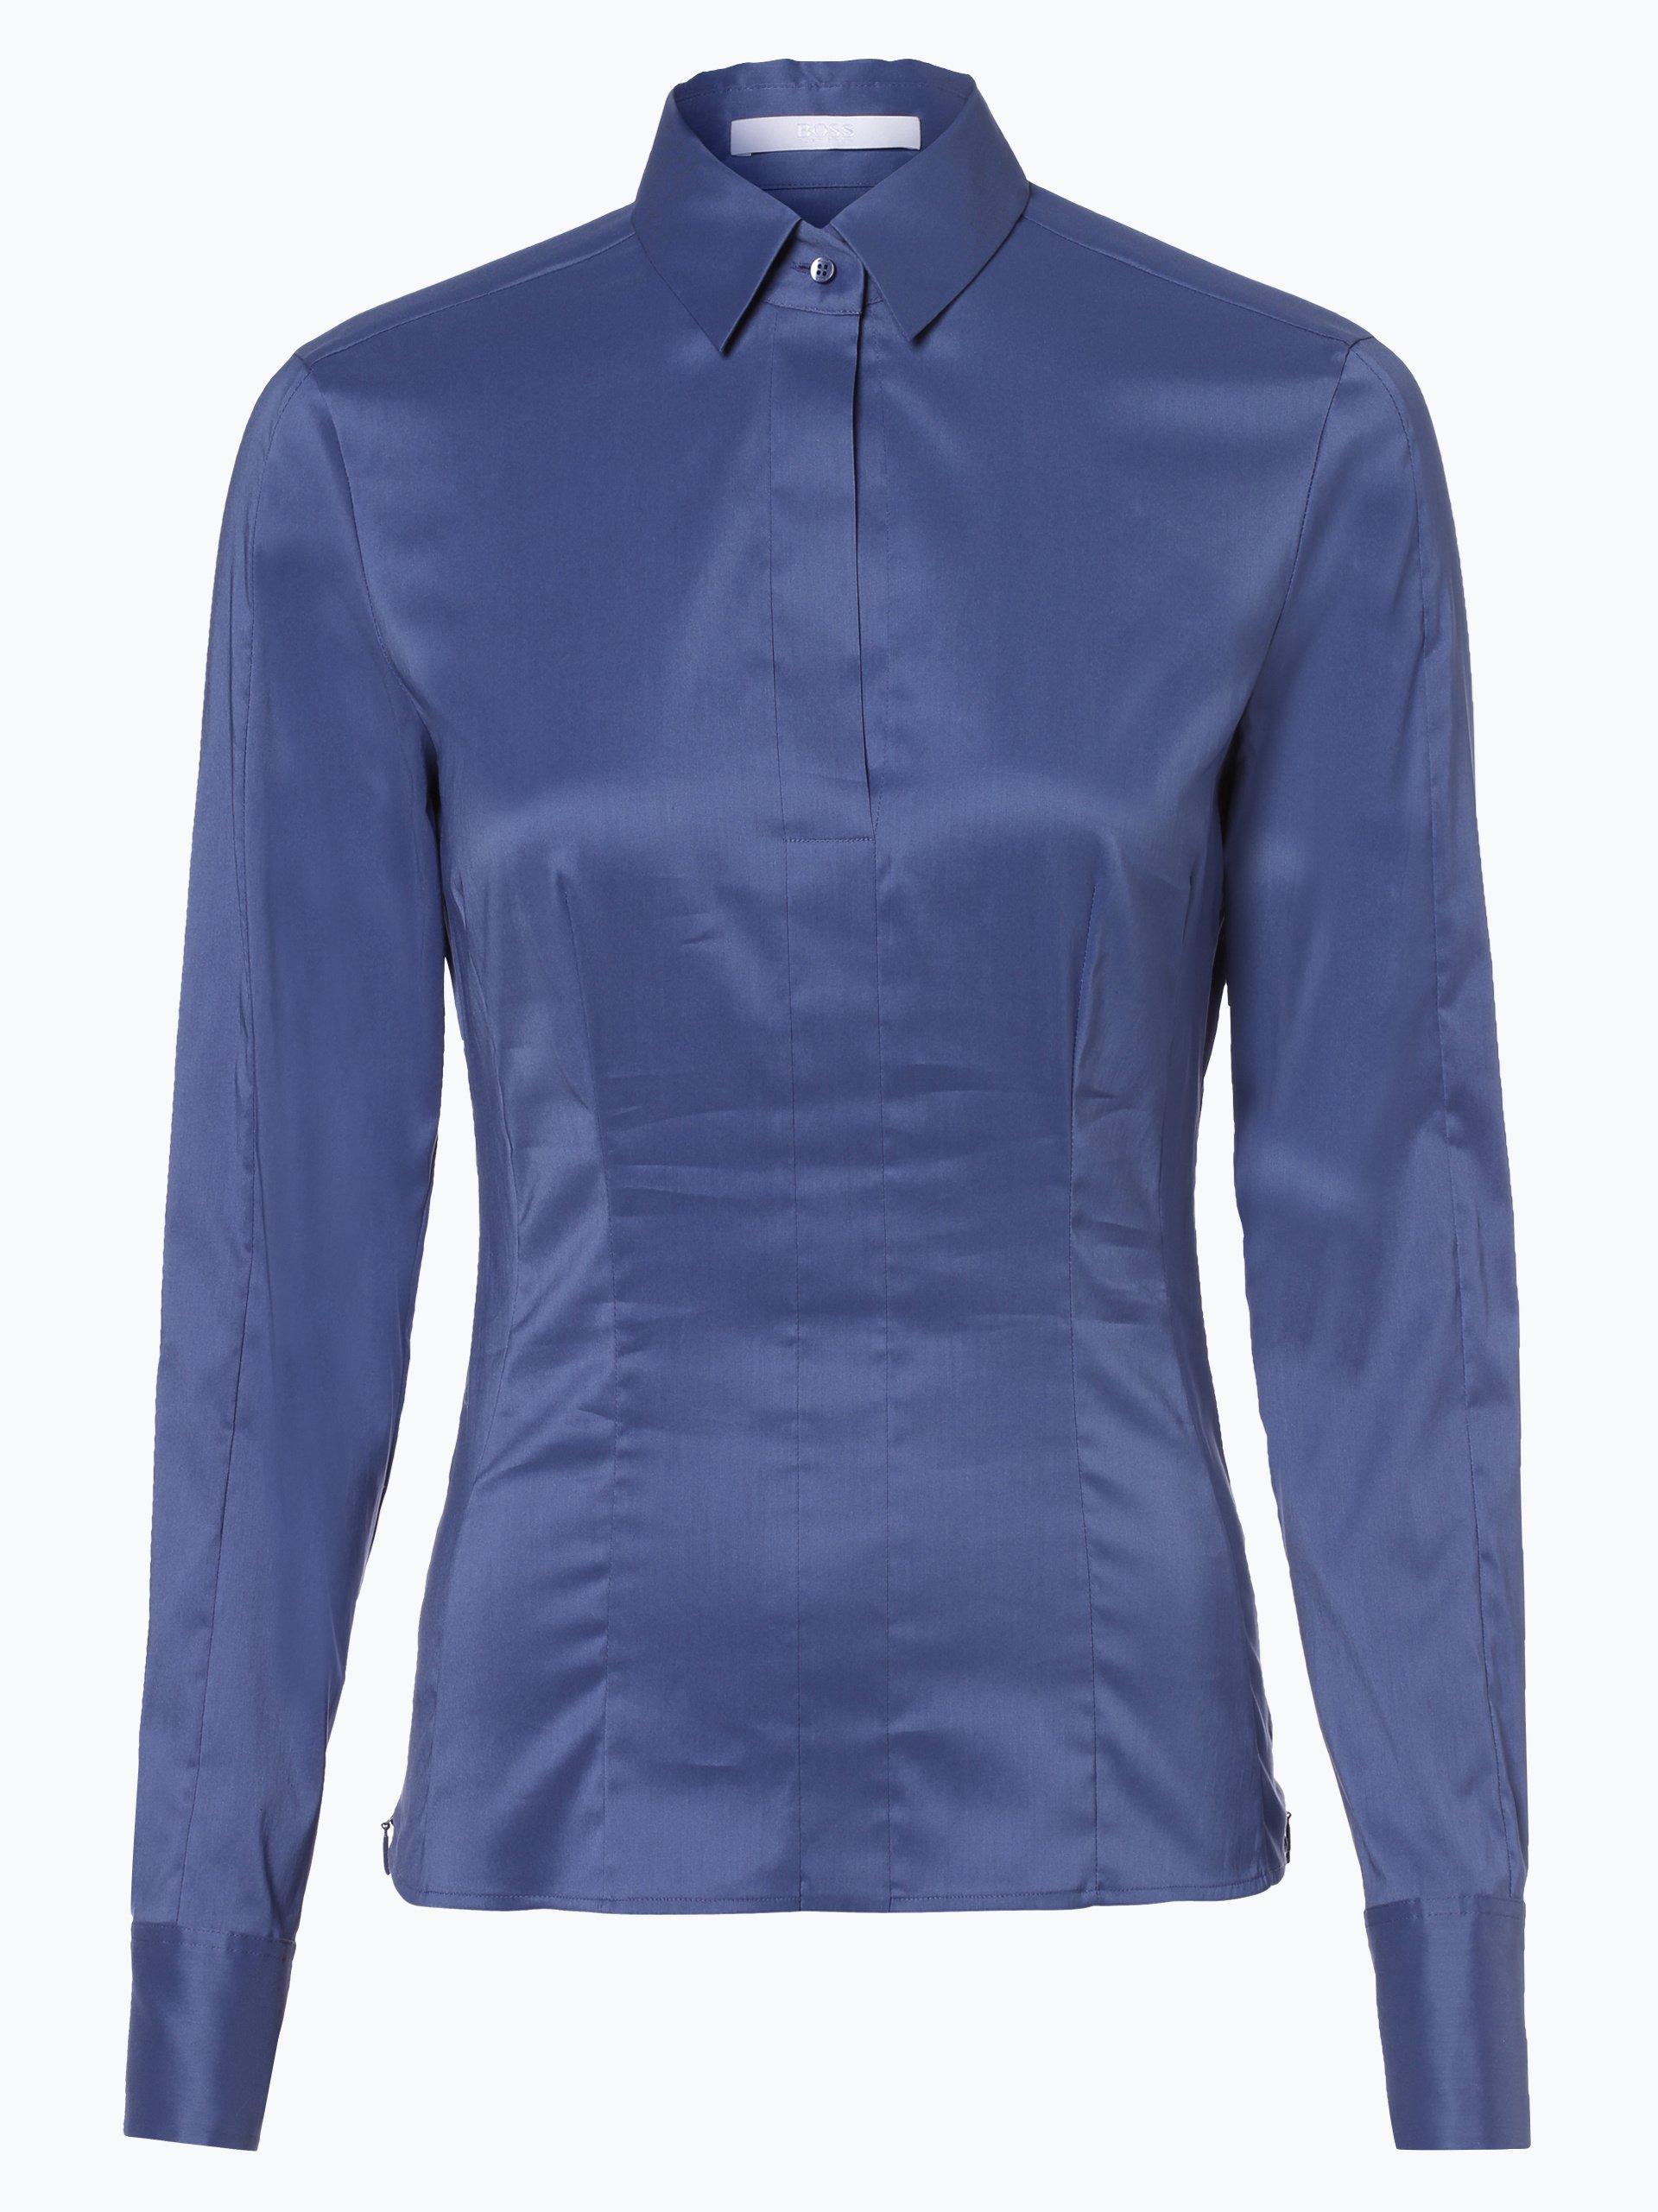 BOSS Damen Bluse - Bashina6